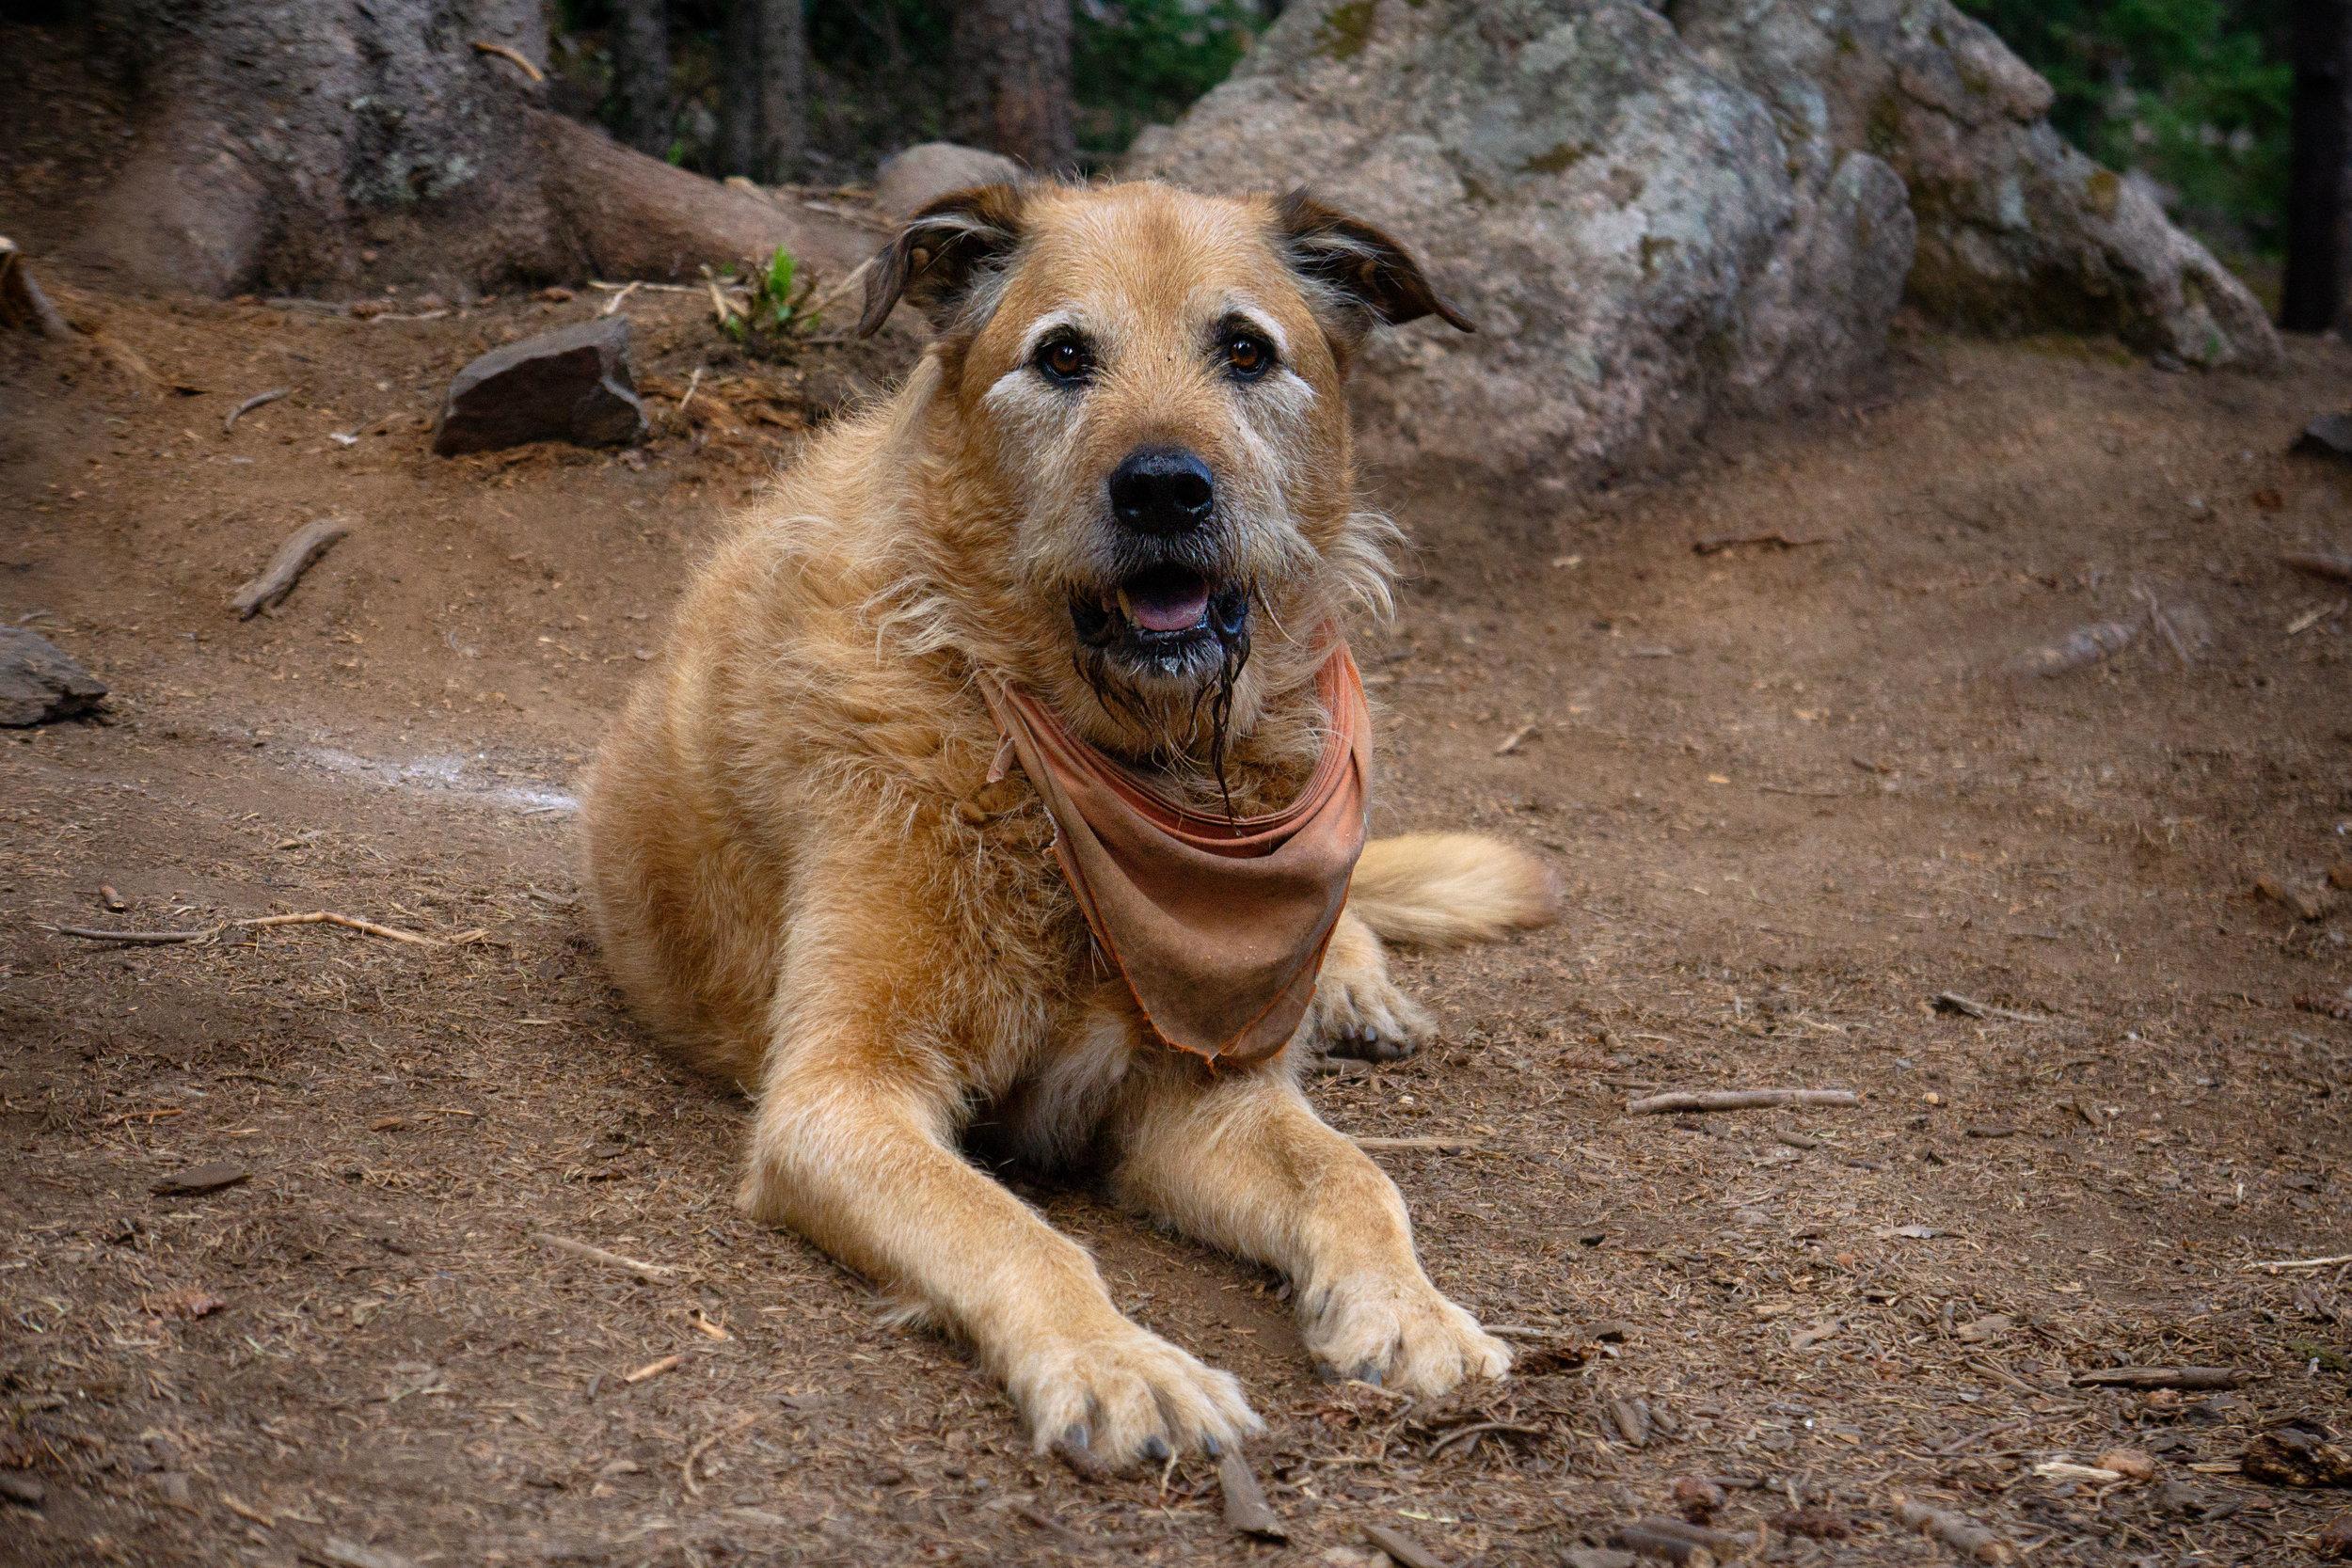 vickygood_travel_photography_colorado_dog_series1.2.jpg